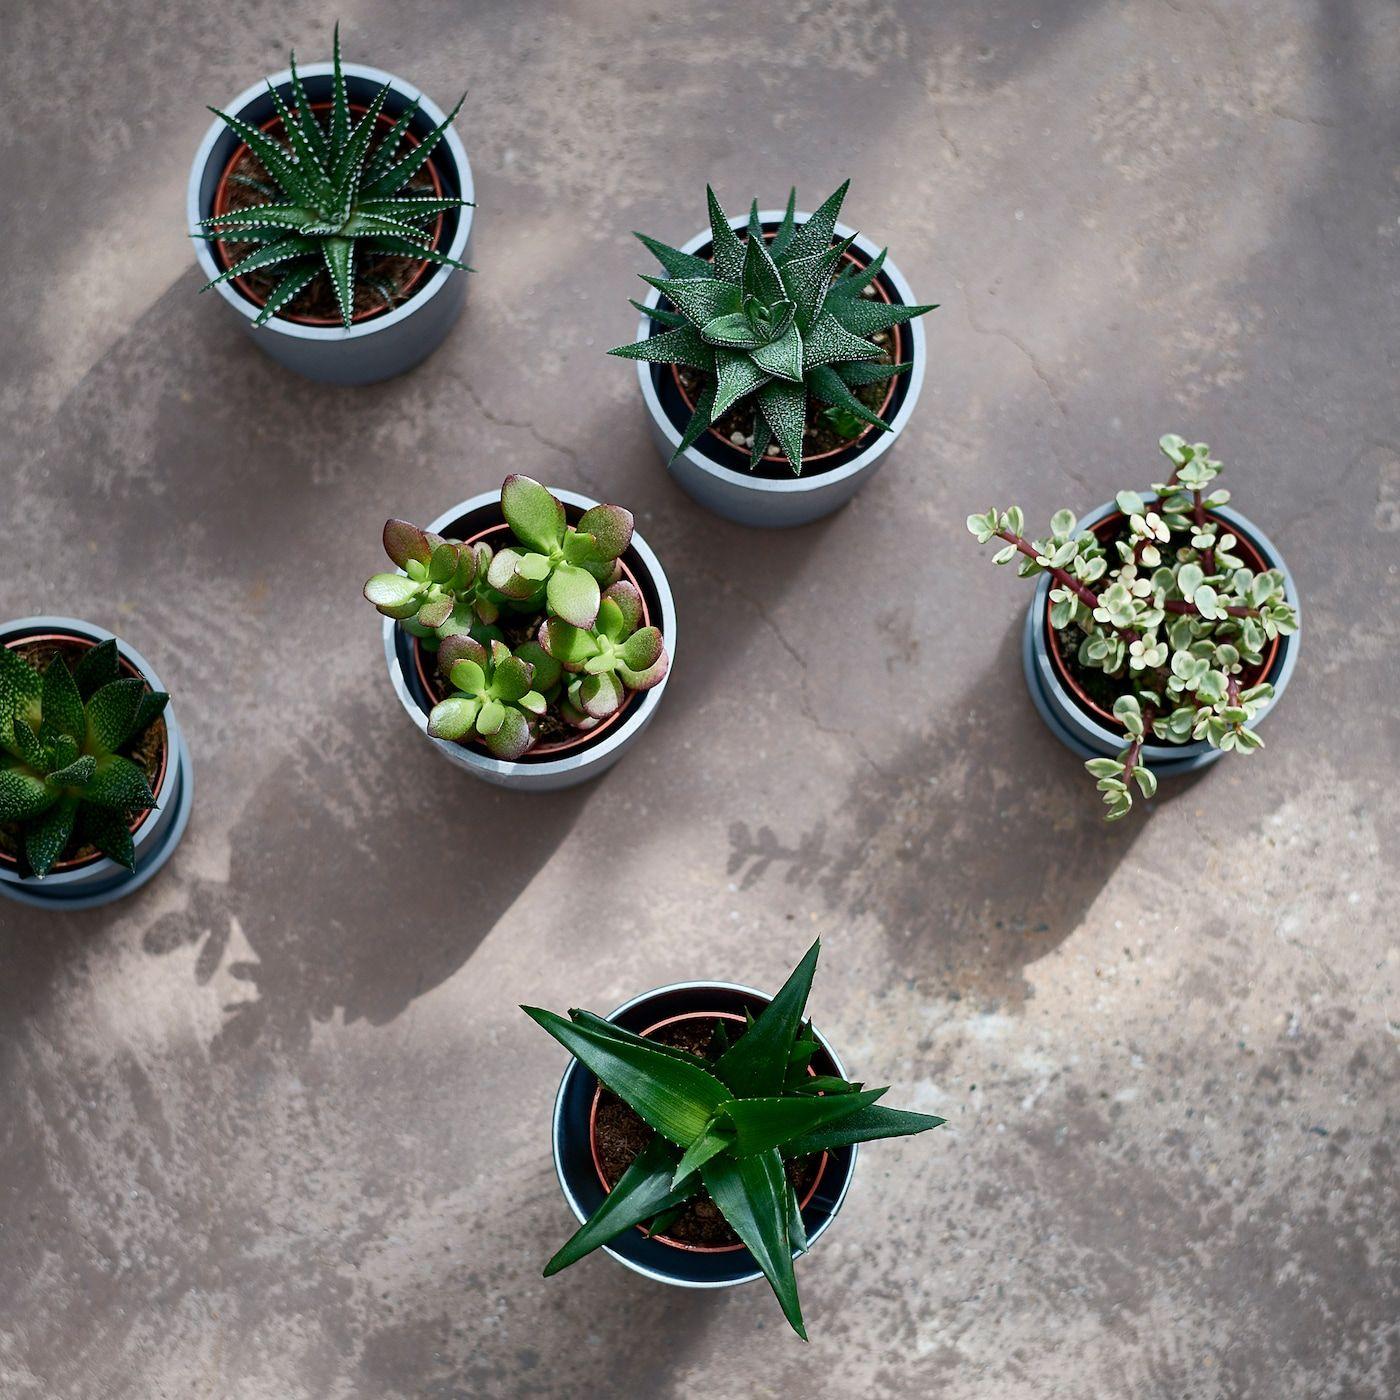 SUCCULENT assorted, Potted plant, Diameter of plant pot: 9 cm - IKEA